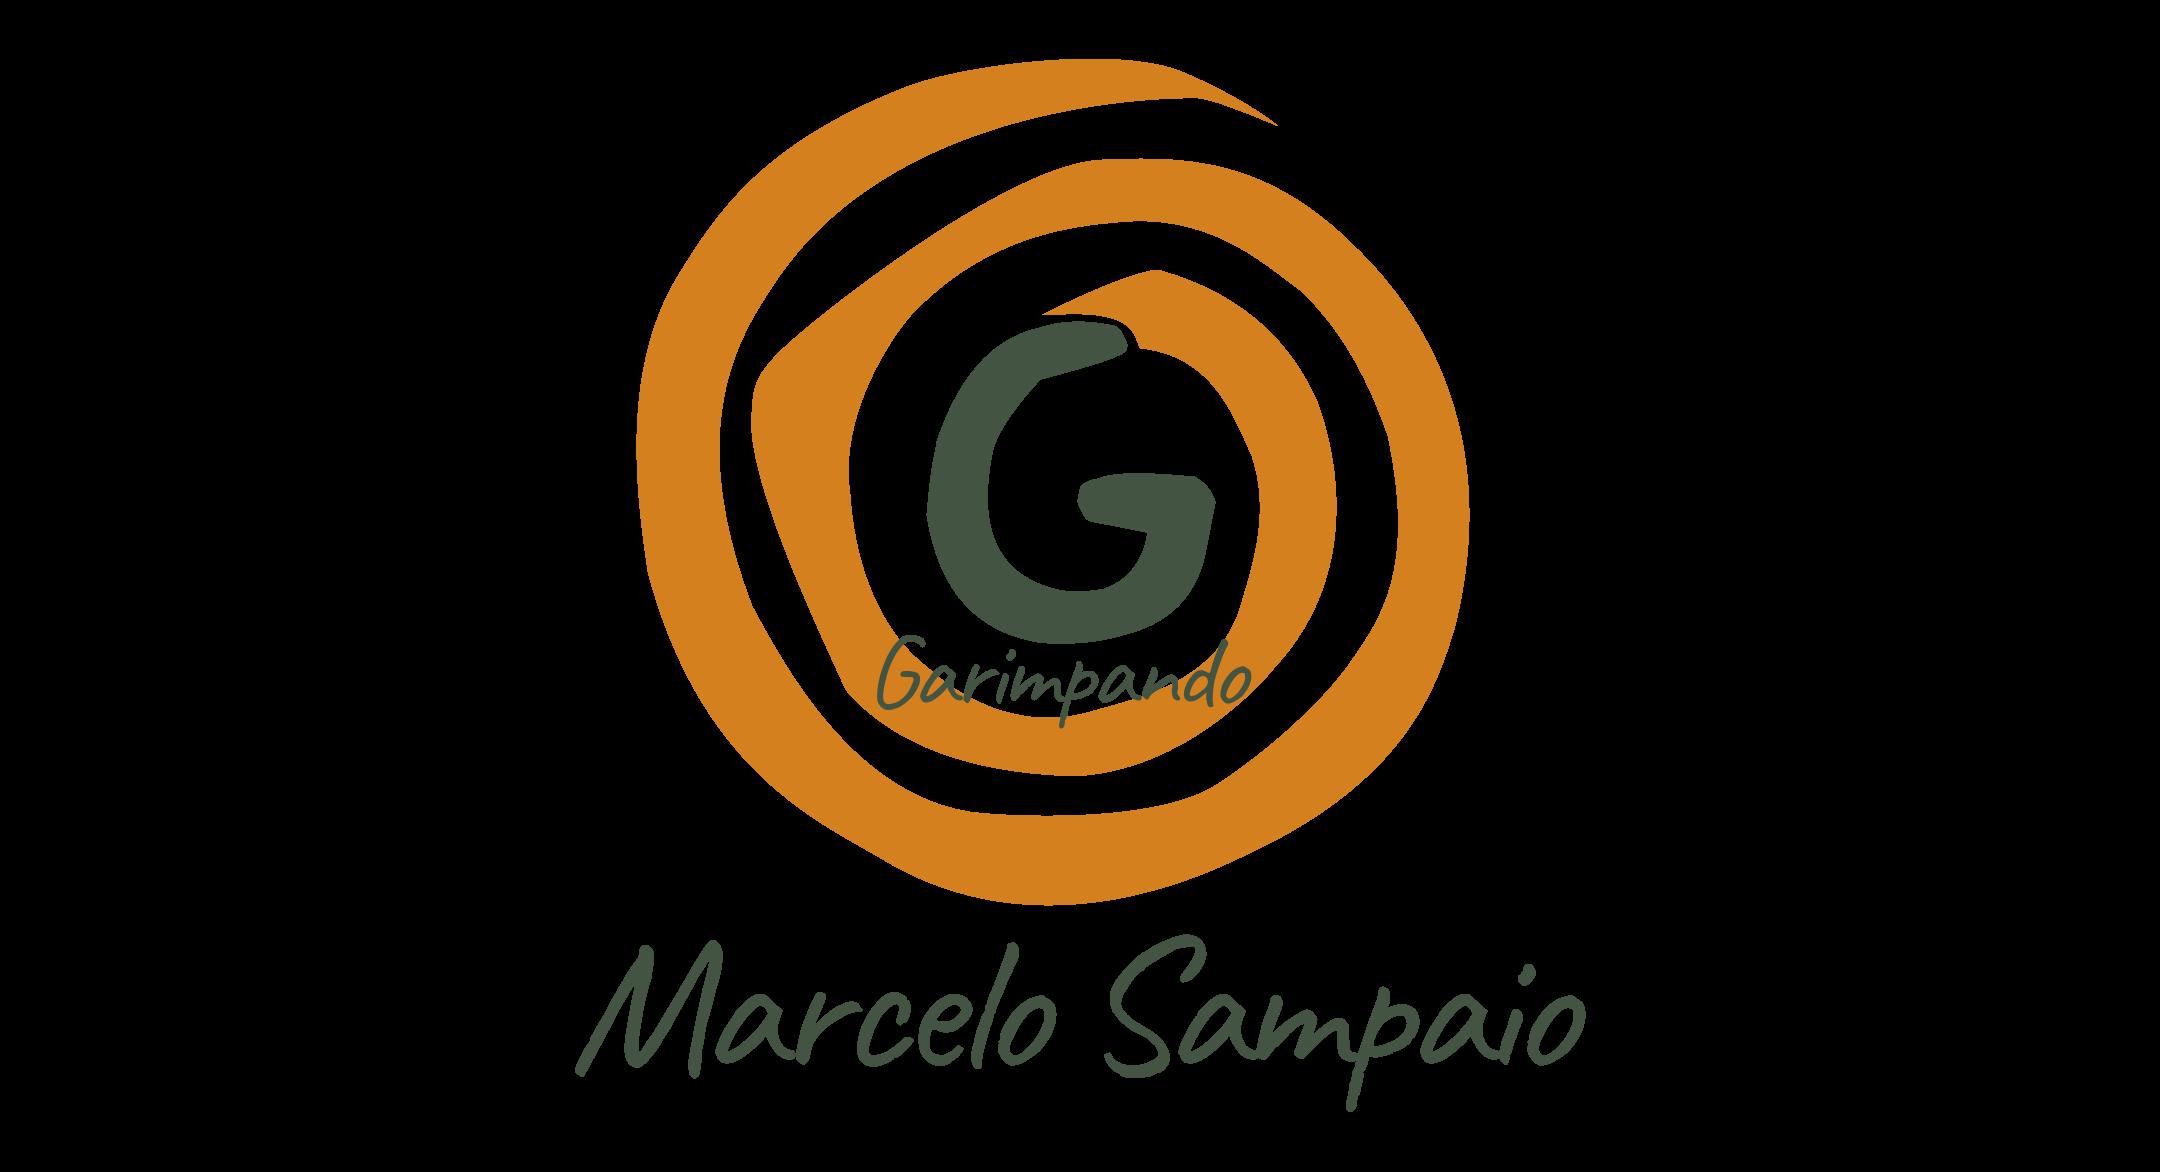 Garimpando - Marcelo Sampaio